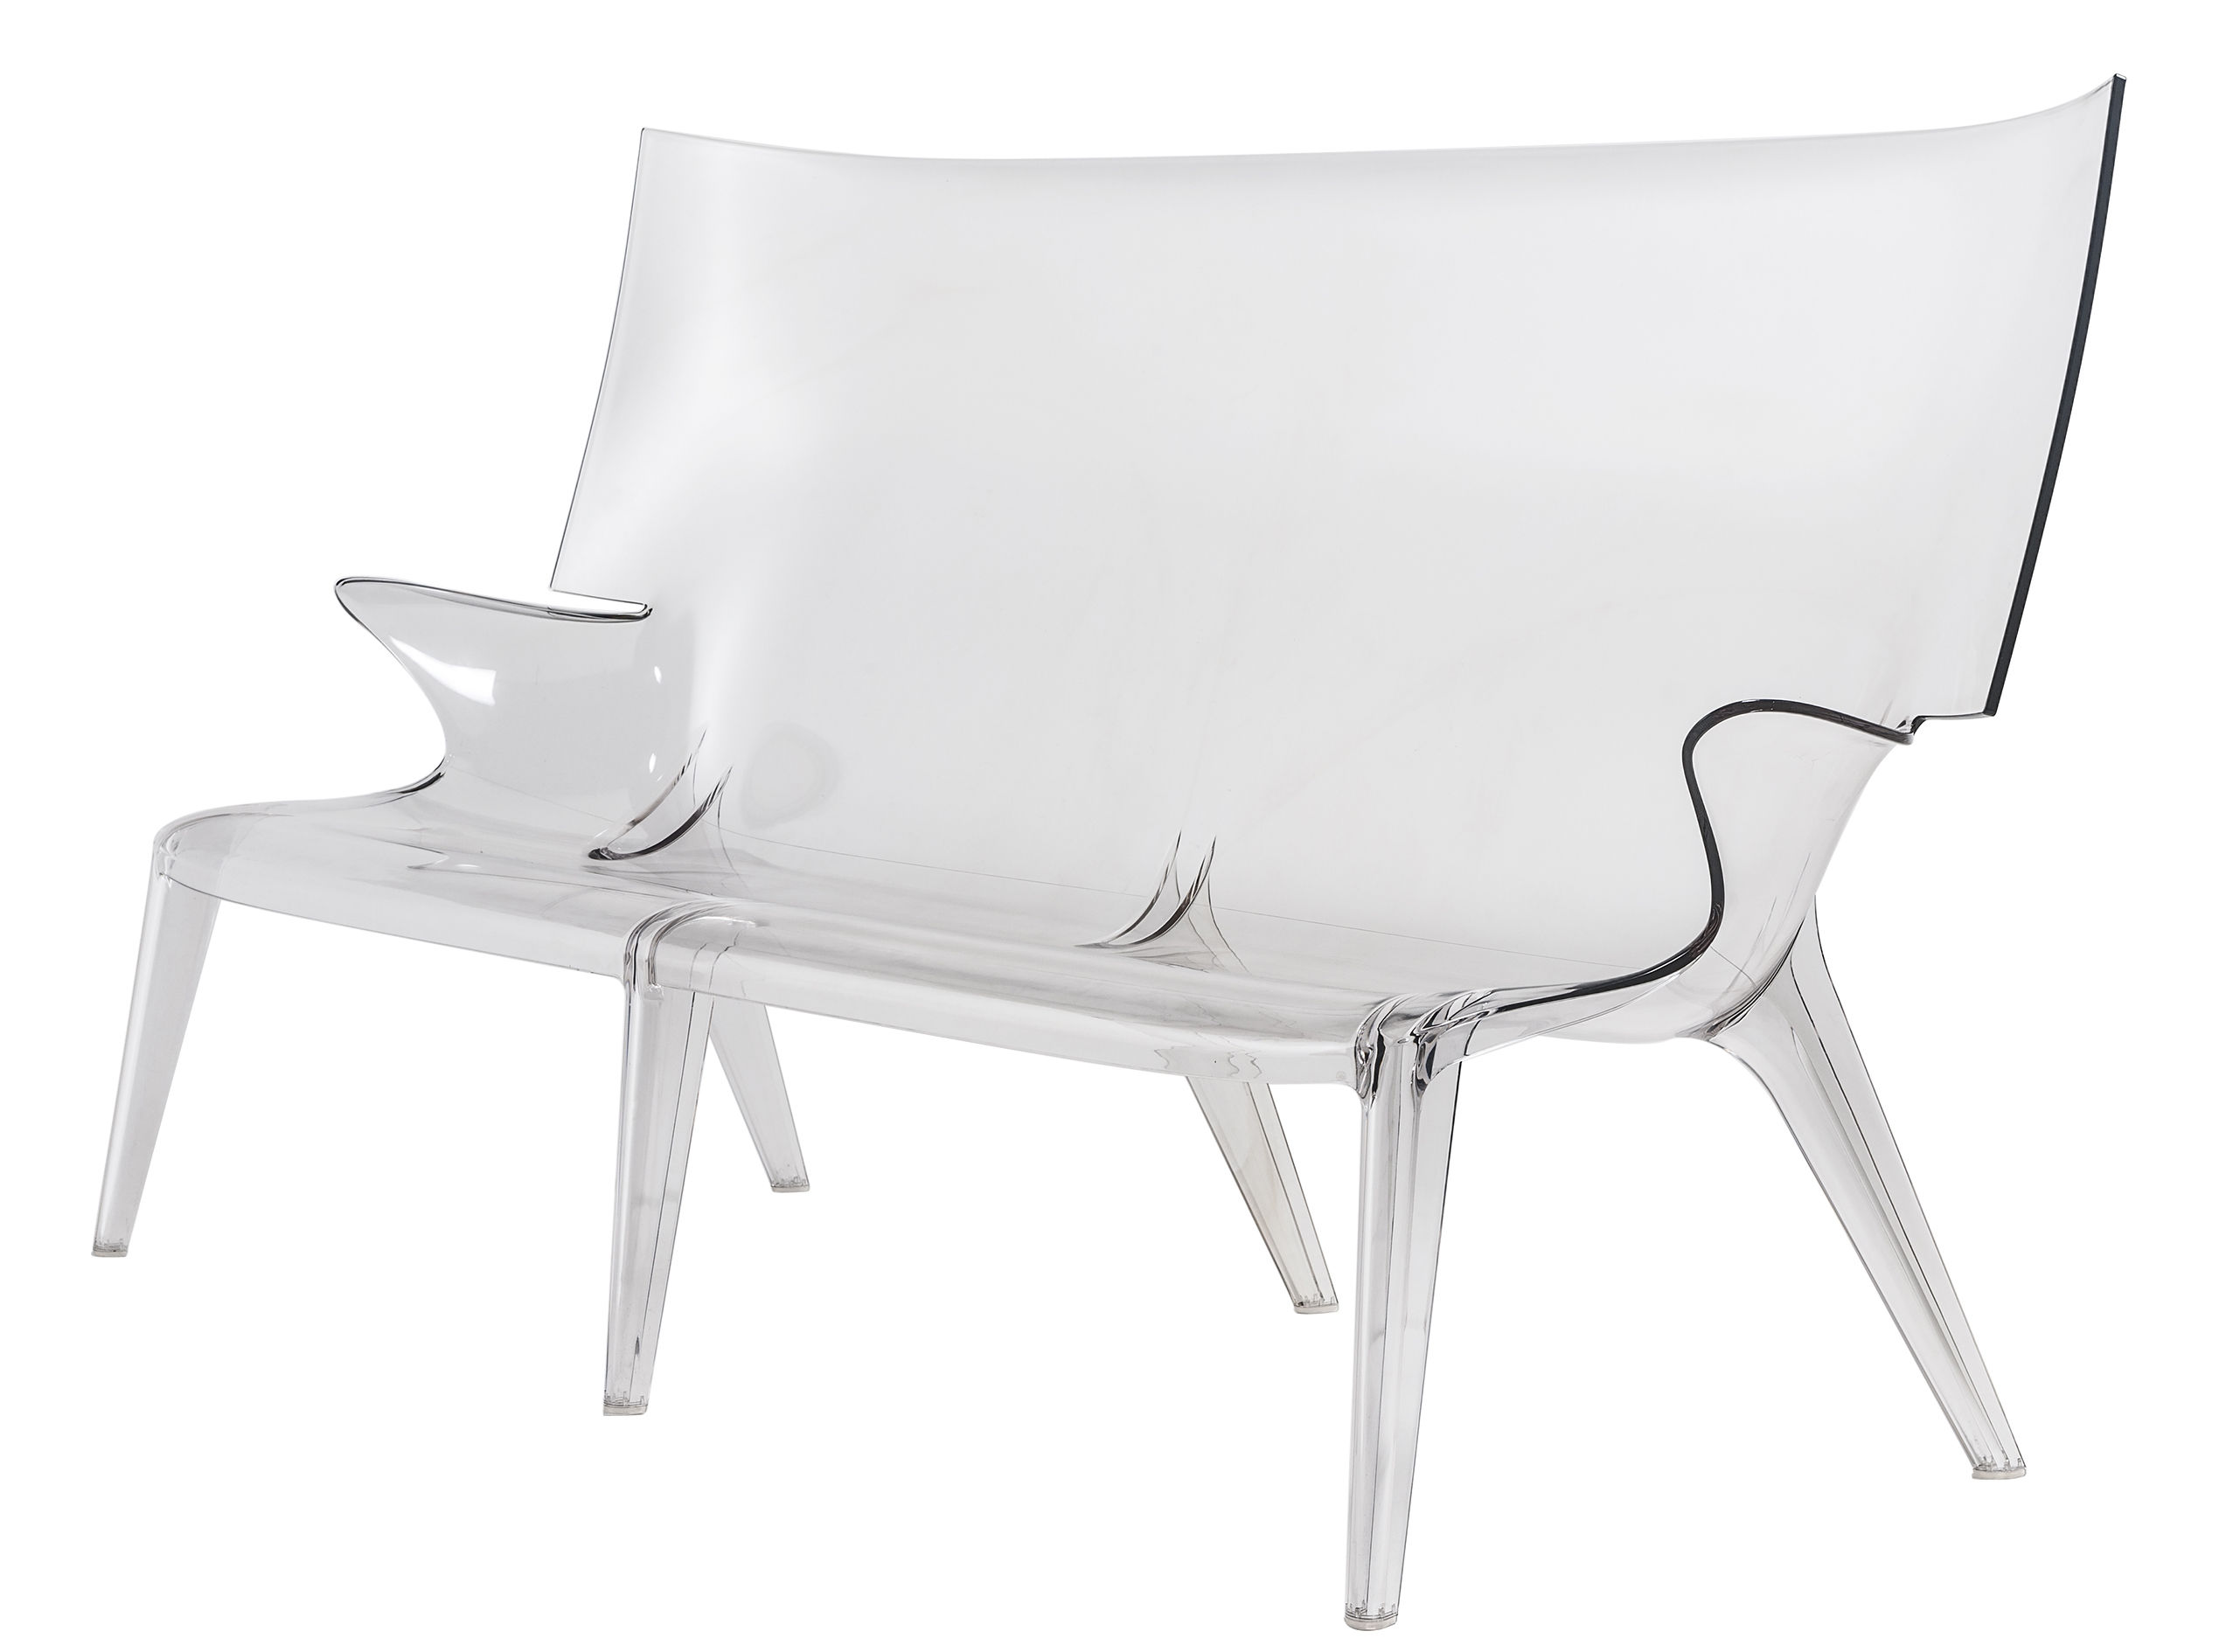 Möbel - Sofas - Uncle Jack Sofa / L 190 cm - Kartell - Transparent (farblos) - Polykarbonat